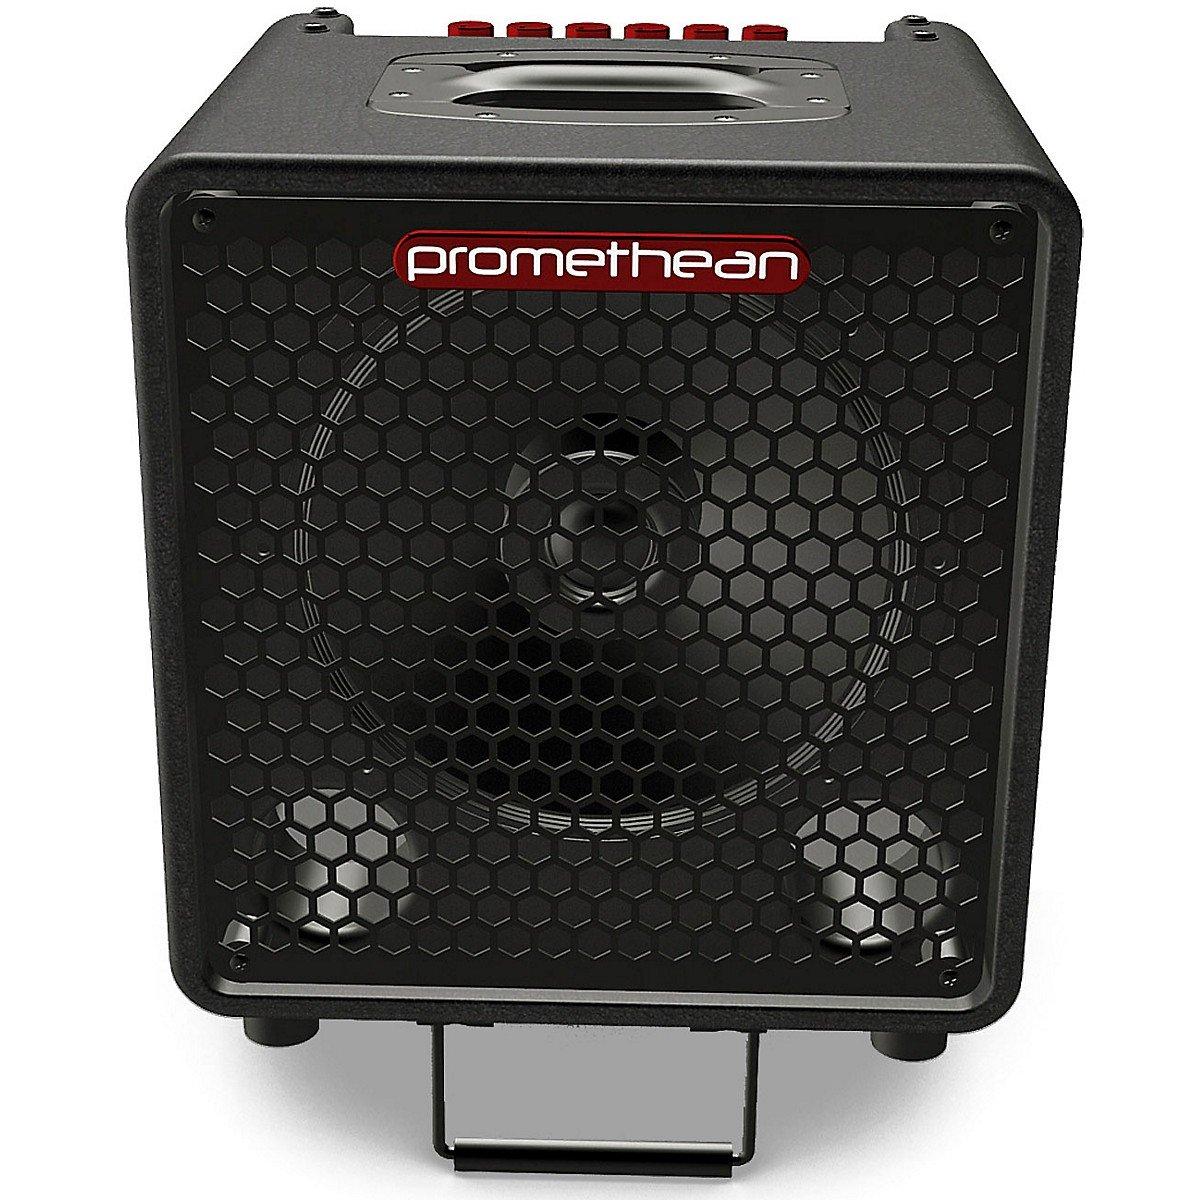 Ibanez Promethean P3110 300 Watt 1x10 Bass Amp